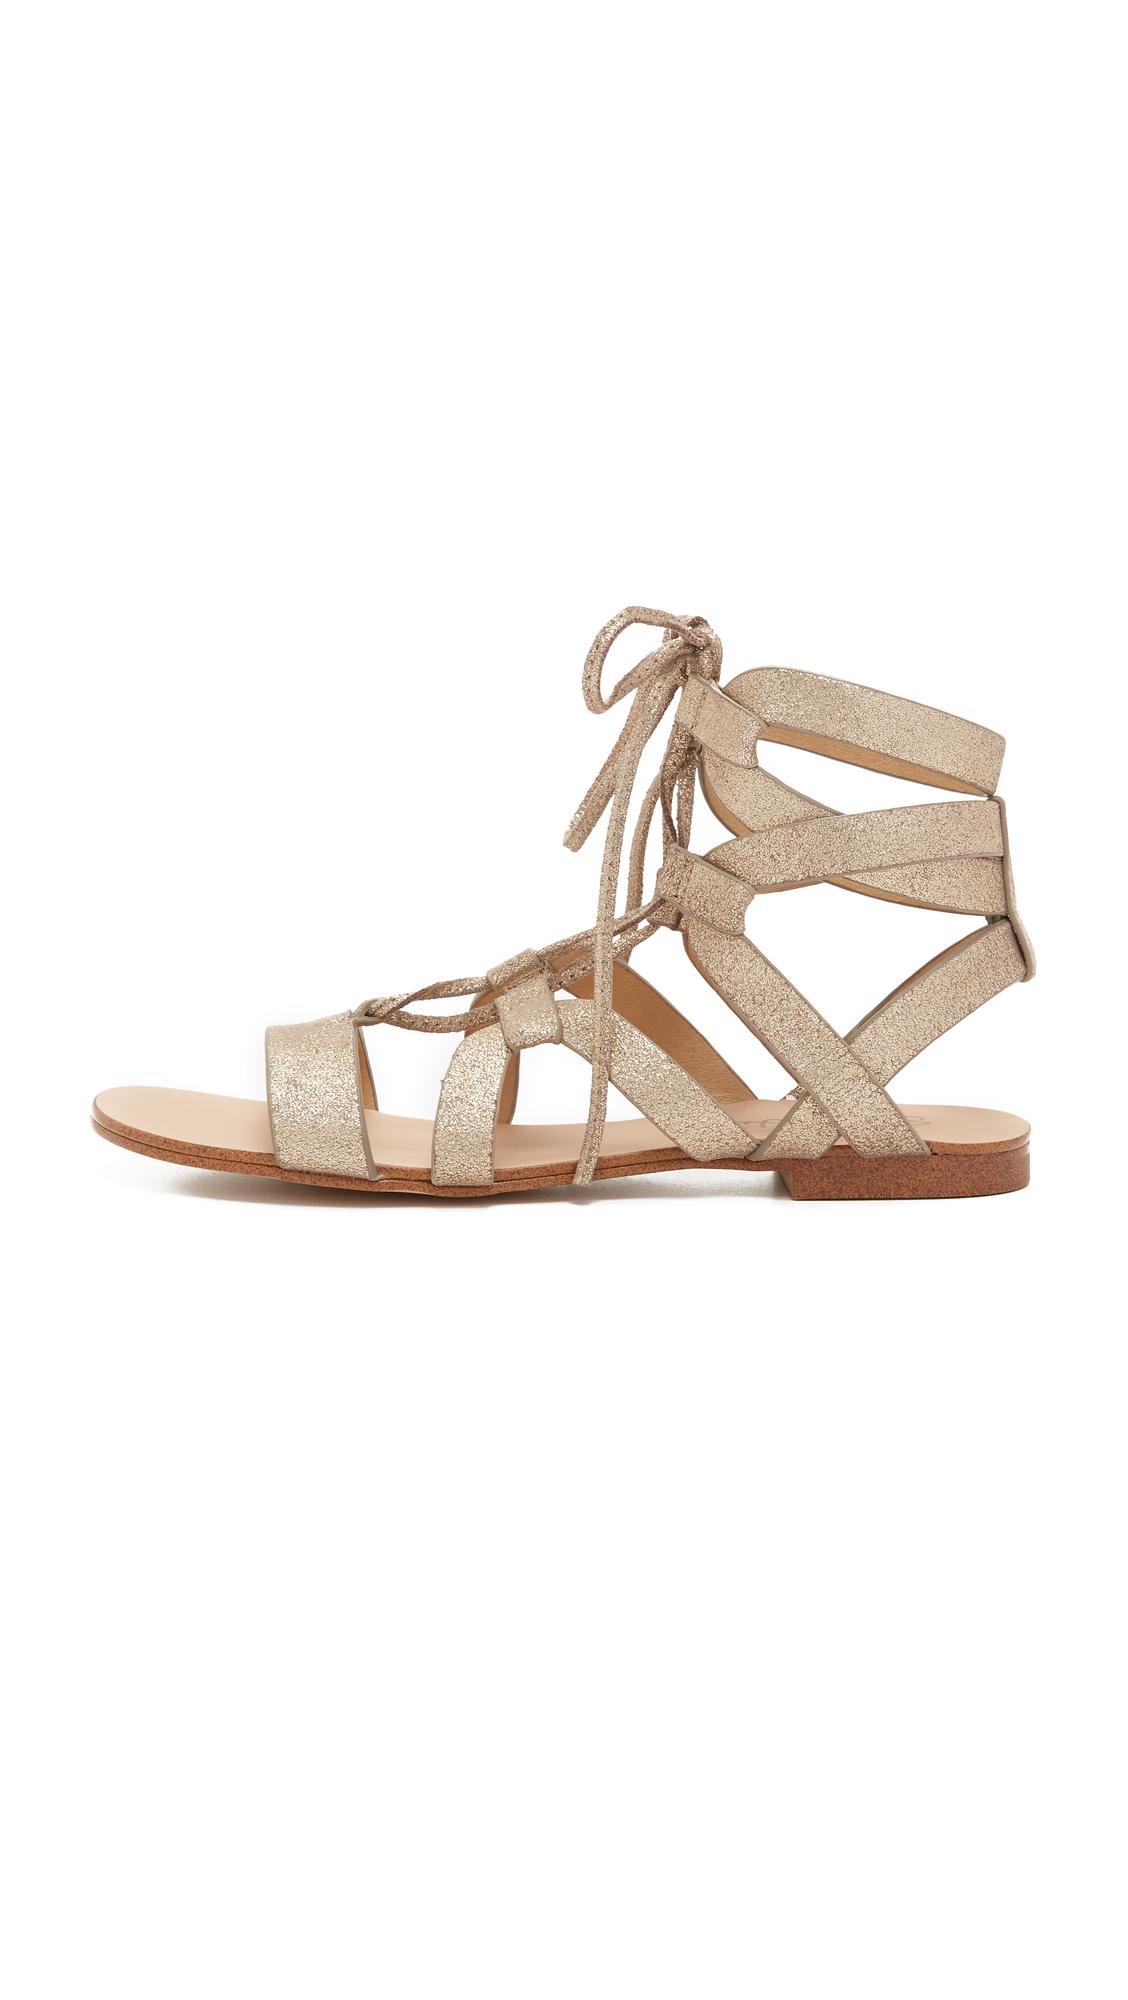 faee6a9837bc Splendid Cameron Gladiator Sandals